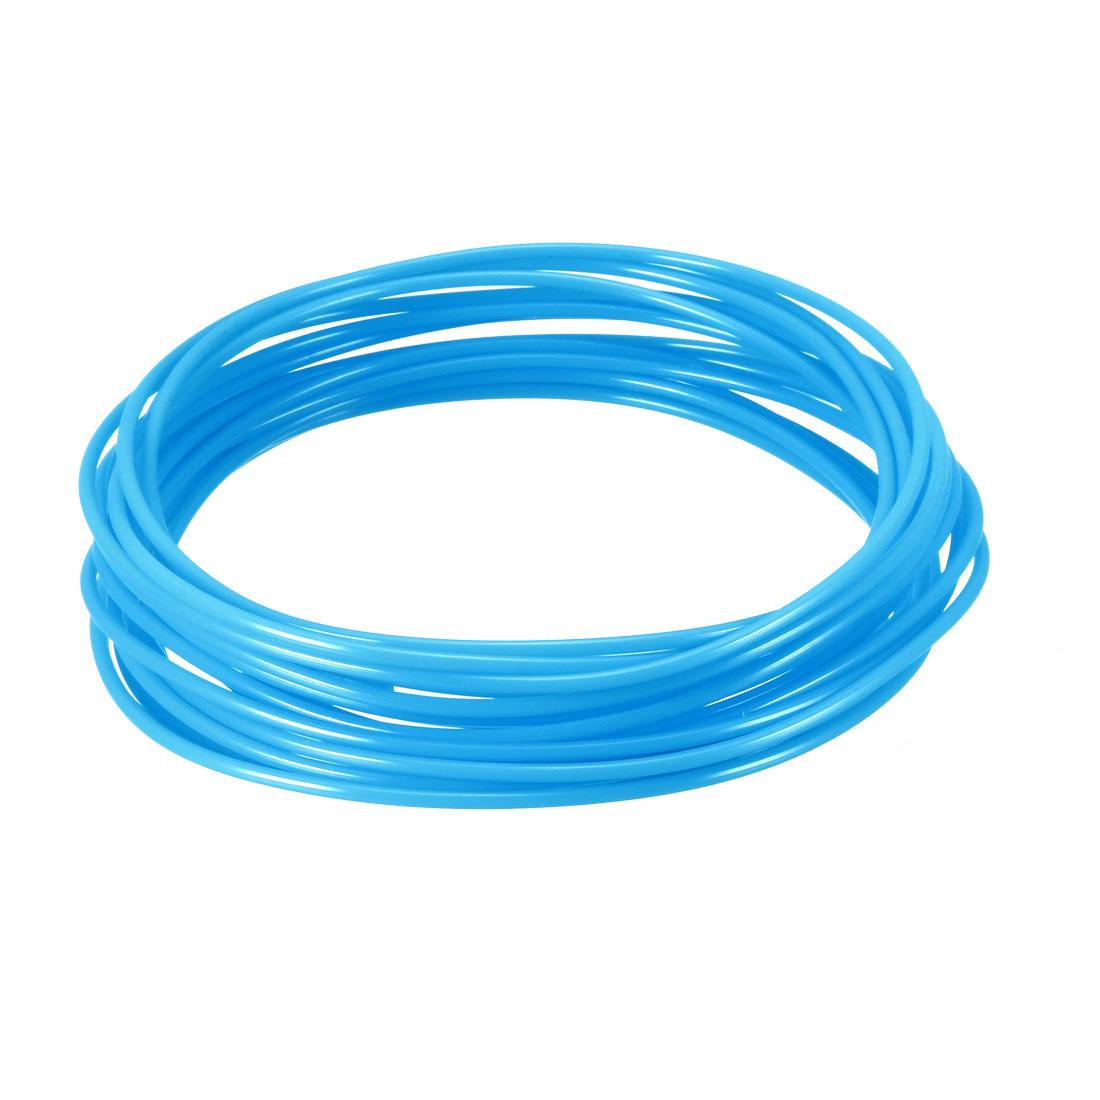 5 Meter/16 Ft PLA 3D Pen/3D Printer Filament, 1.75 mm Luminous Blue